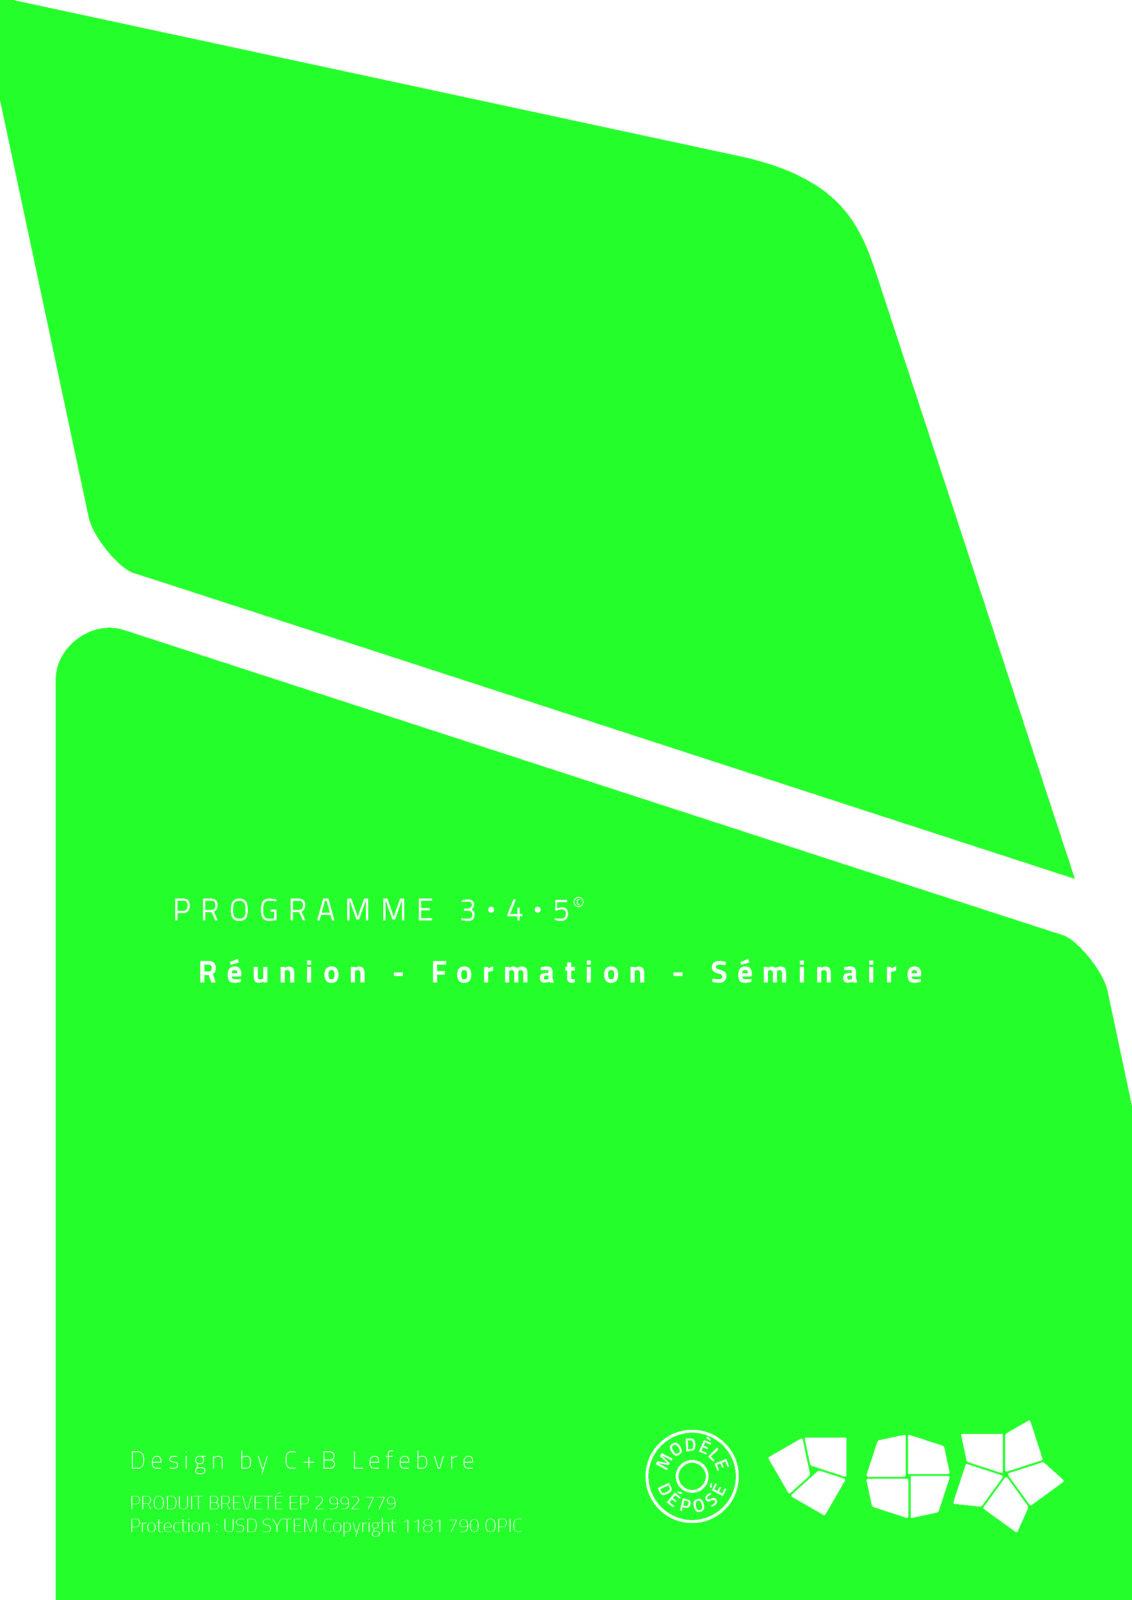 Catalogue mobilier scolaire ia france